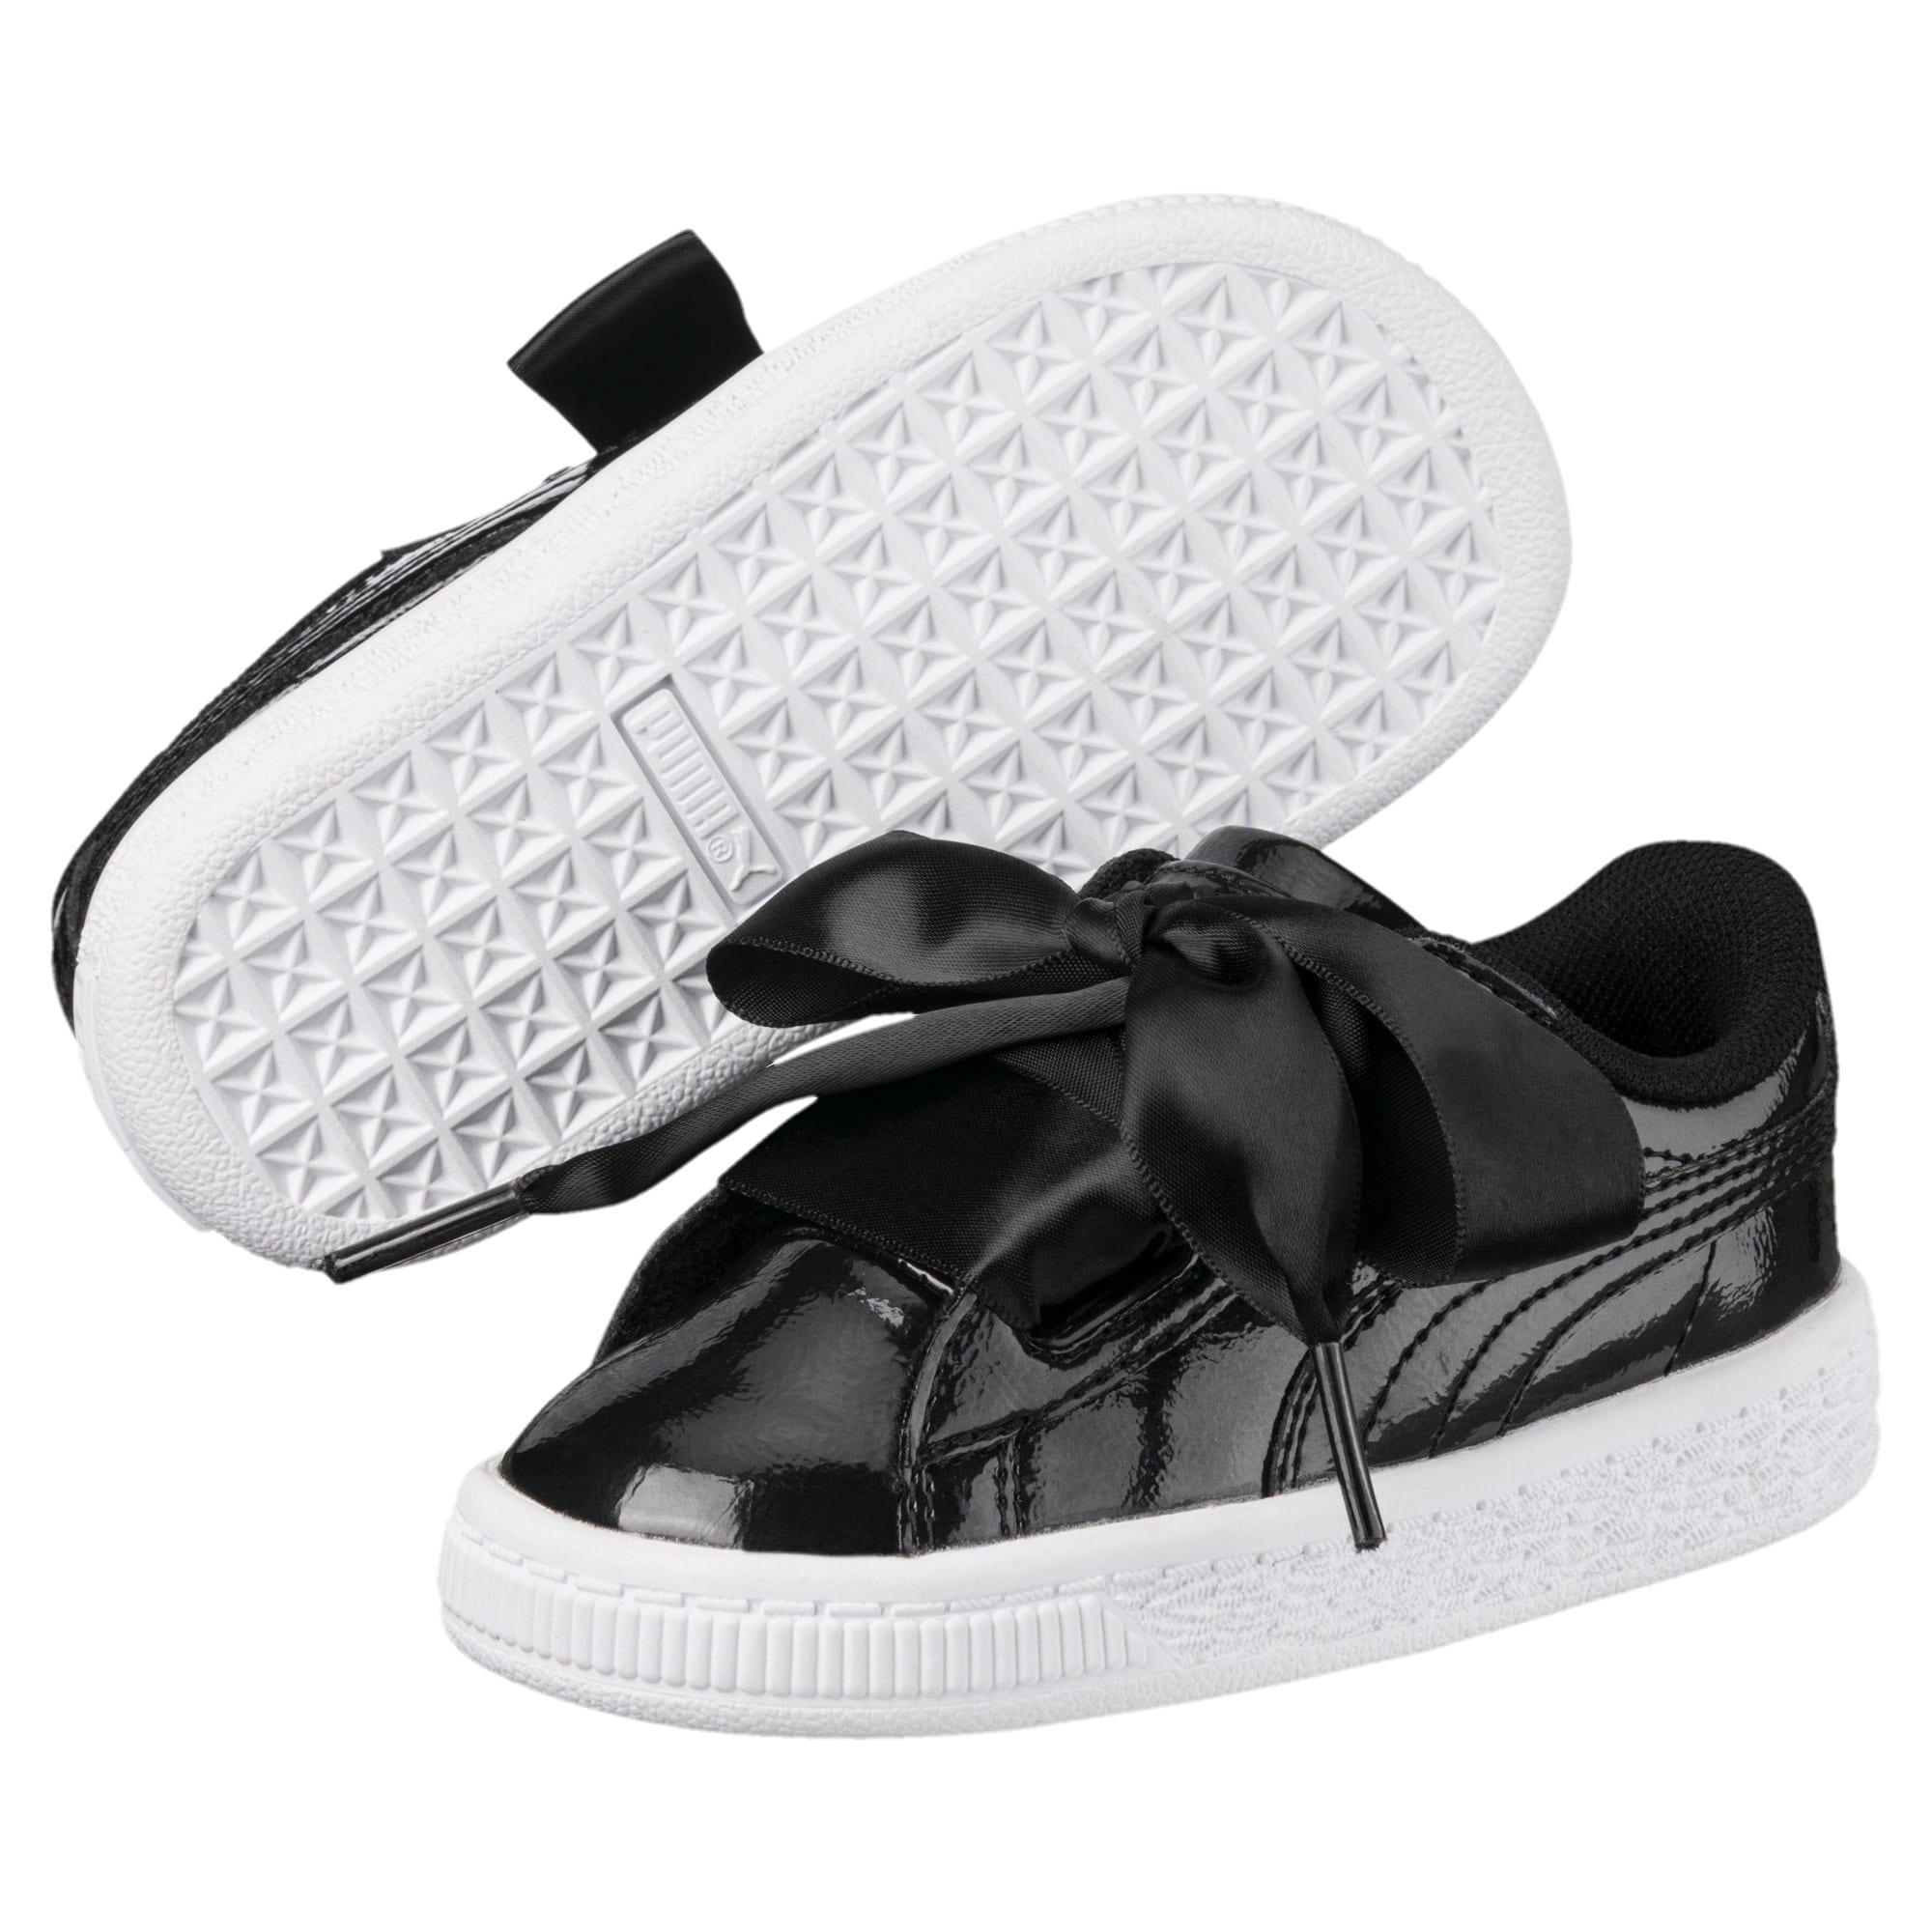 Thumbnail 2 of Basket Heart Glam Little Kids' Shoes, Puma Black-Puma Black, medium